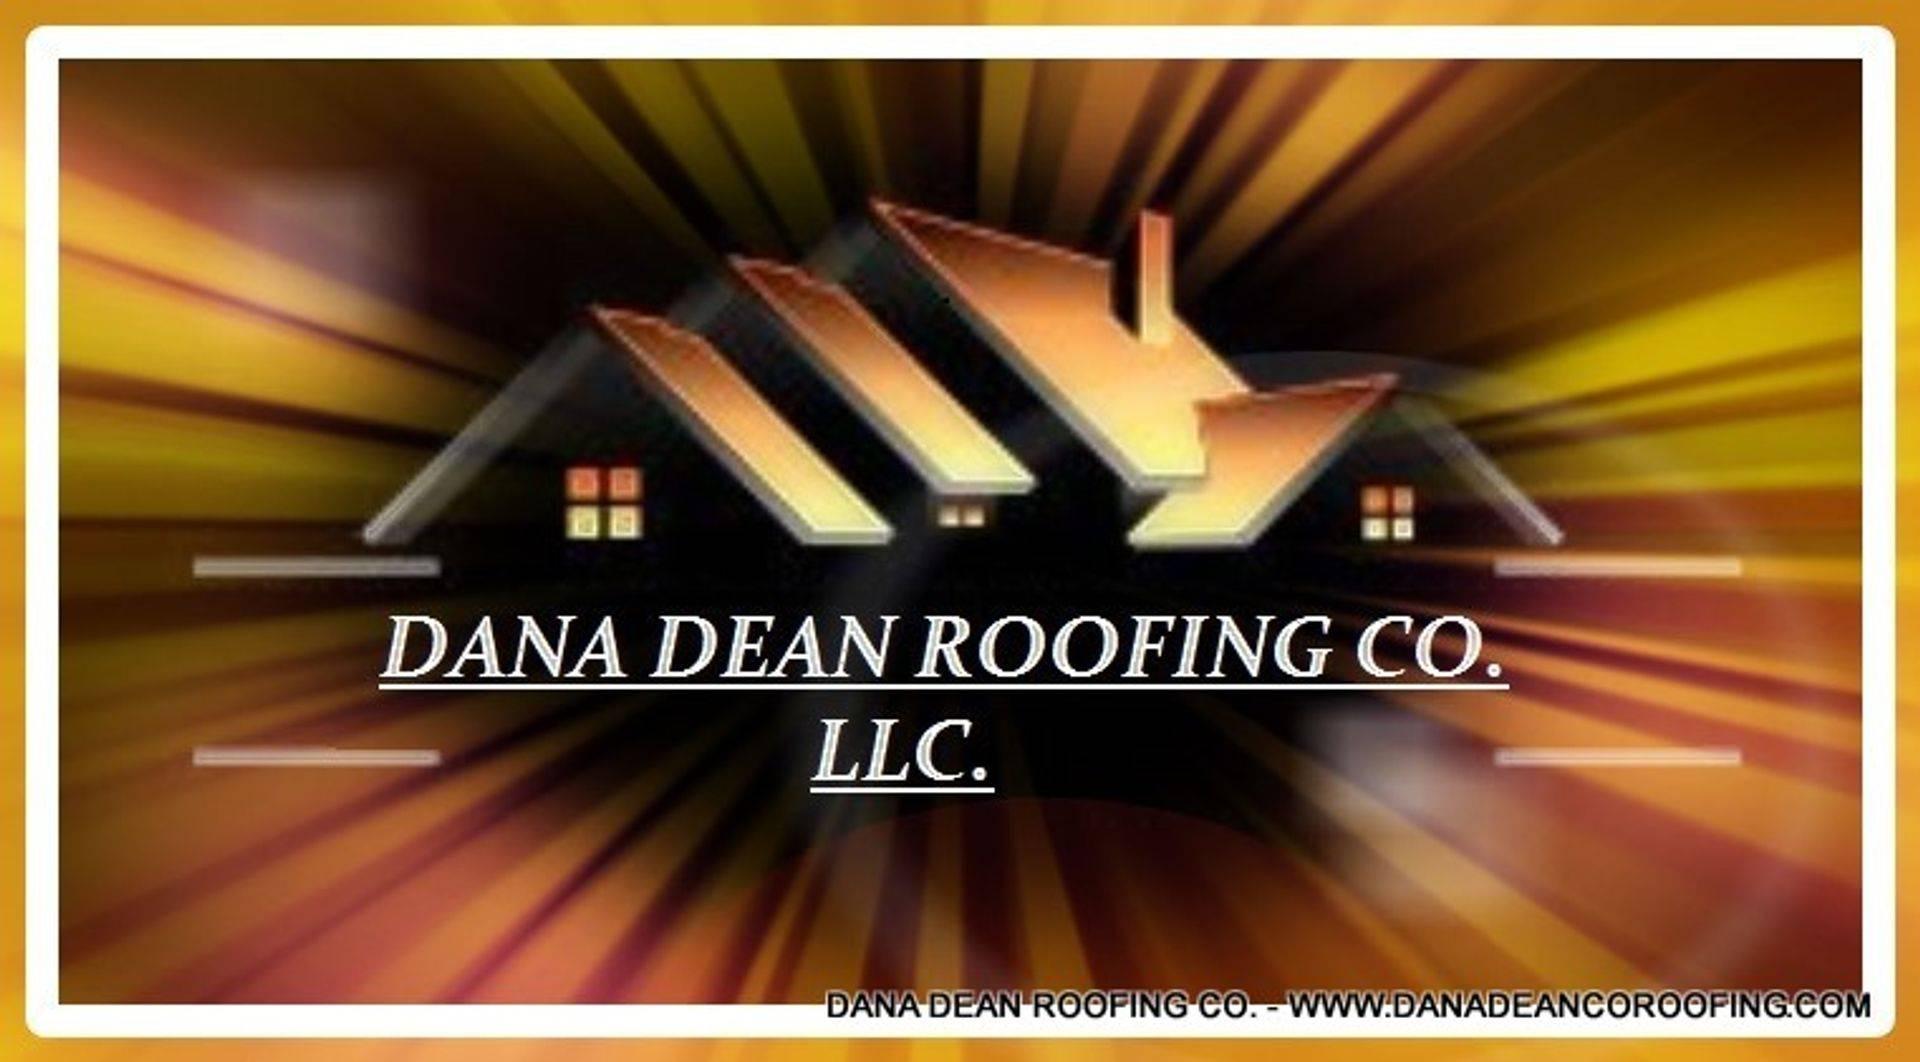 Dana Dean Roofing